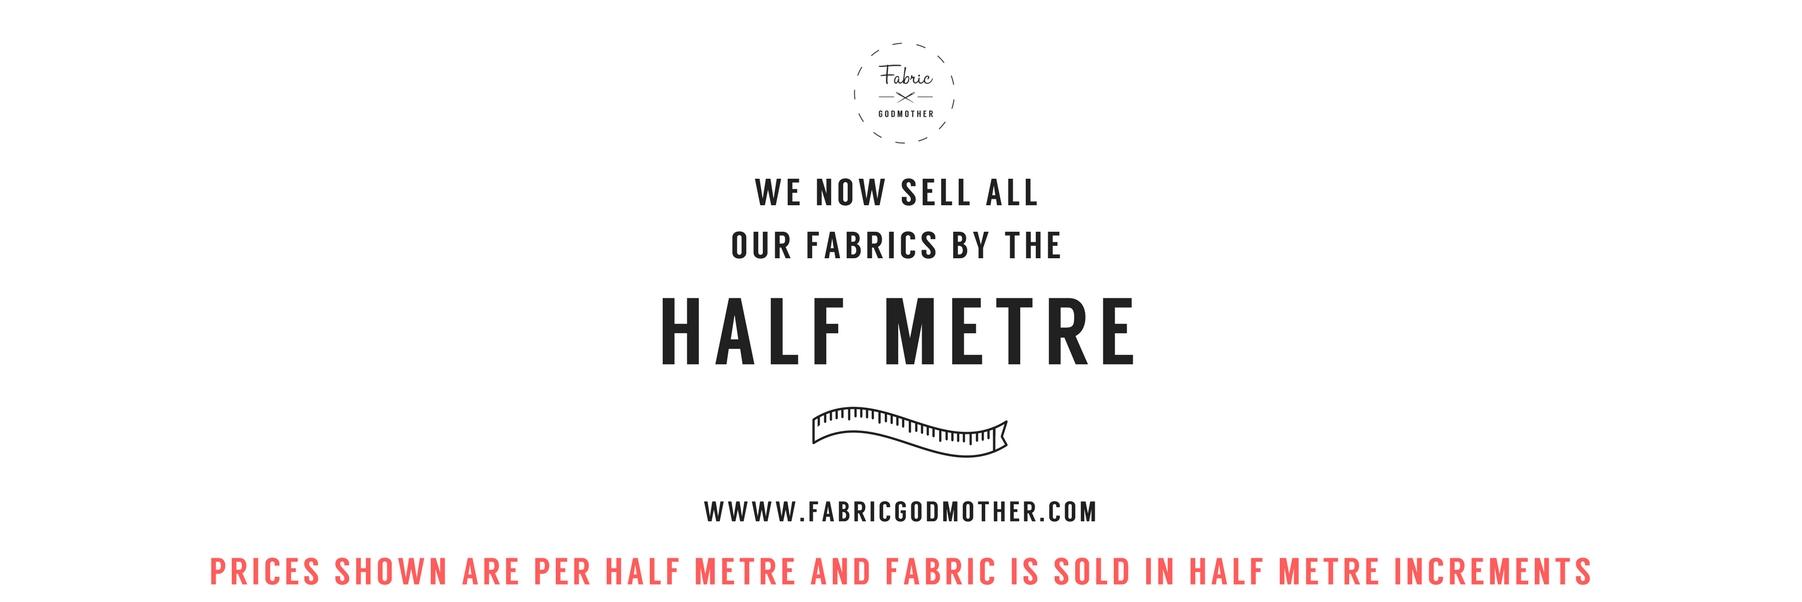 Dress fabric fabric godmother dressmaking fabrics to buy online jeuxipadfo Gallery